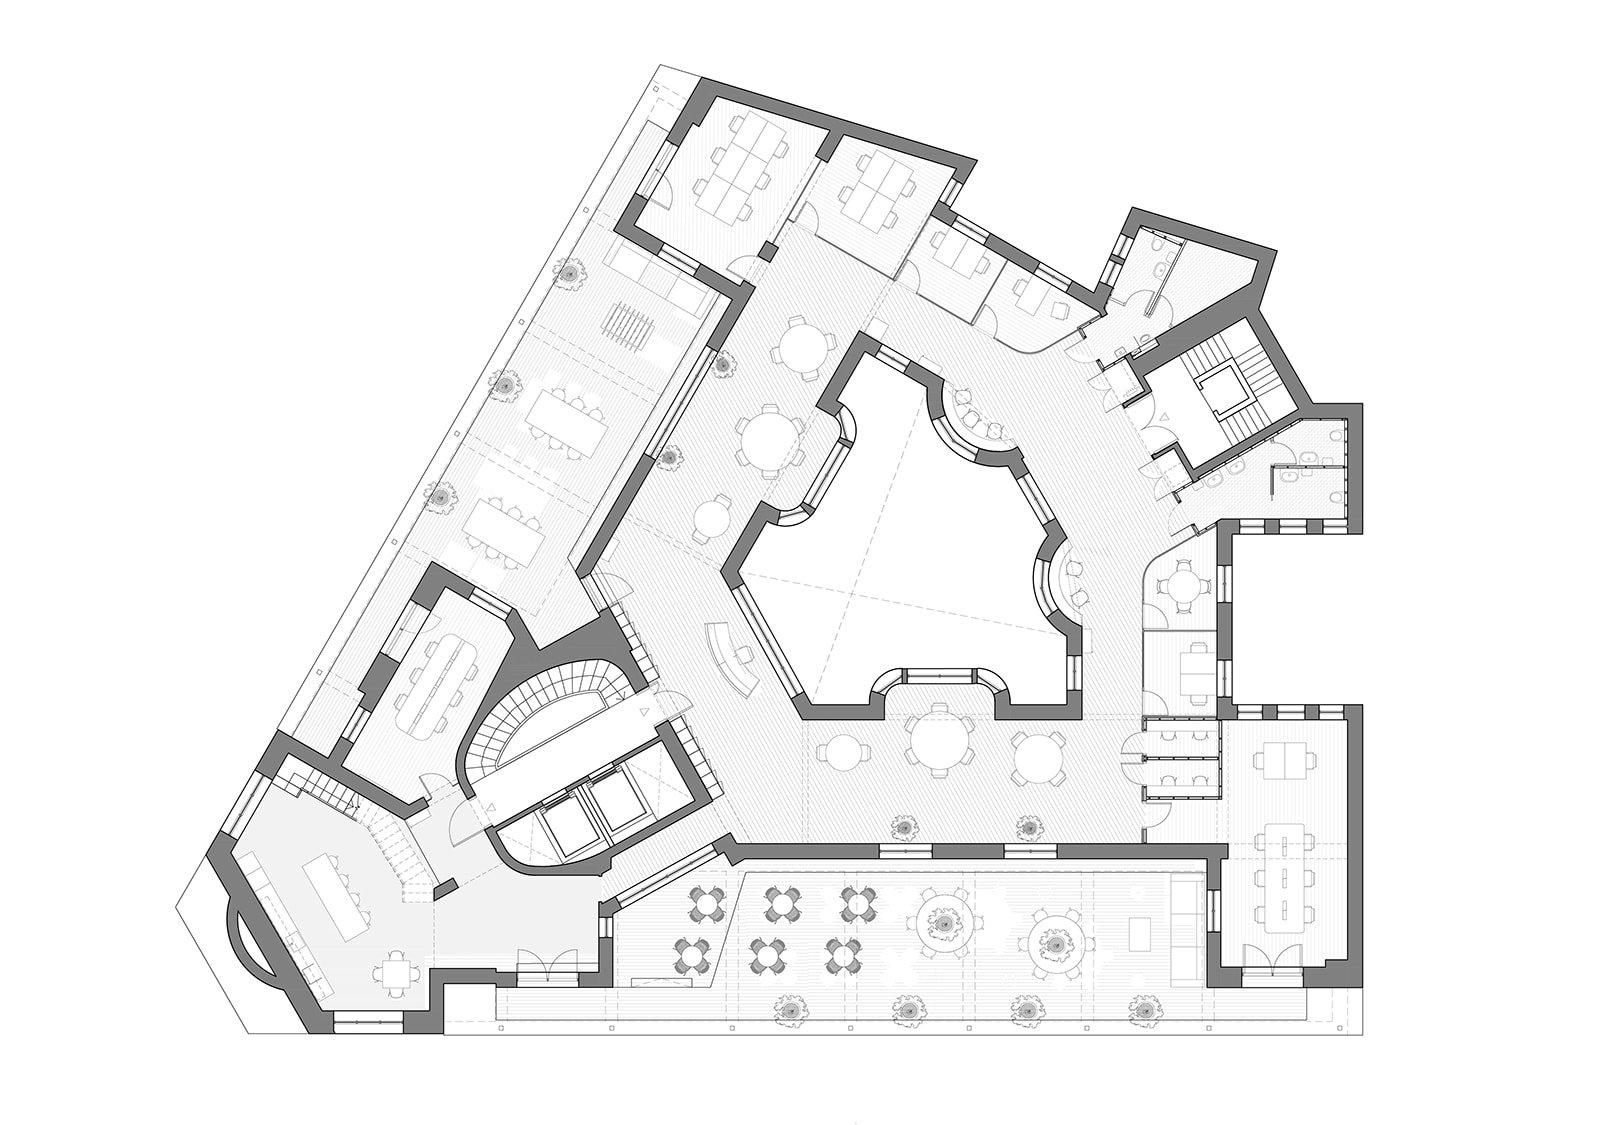 Elastiko-architects_CloudAlcala_p6